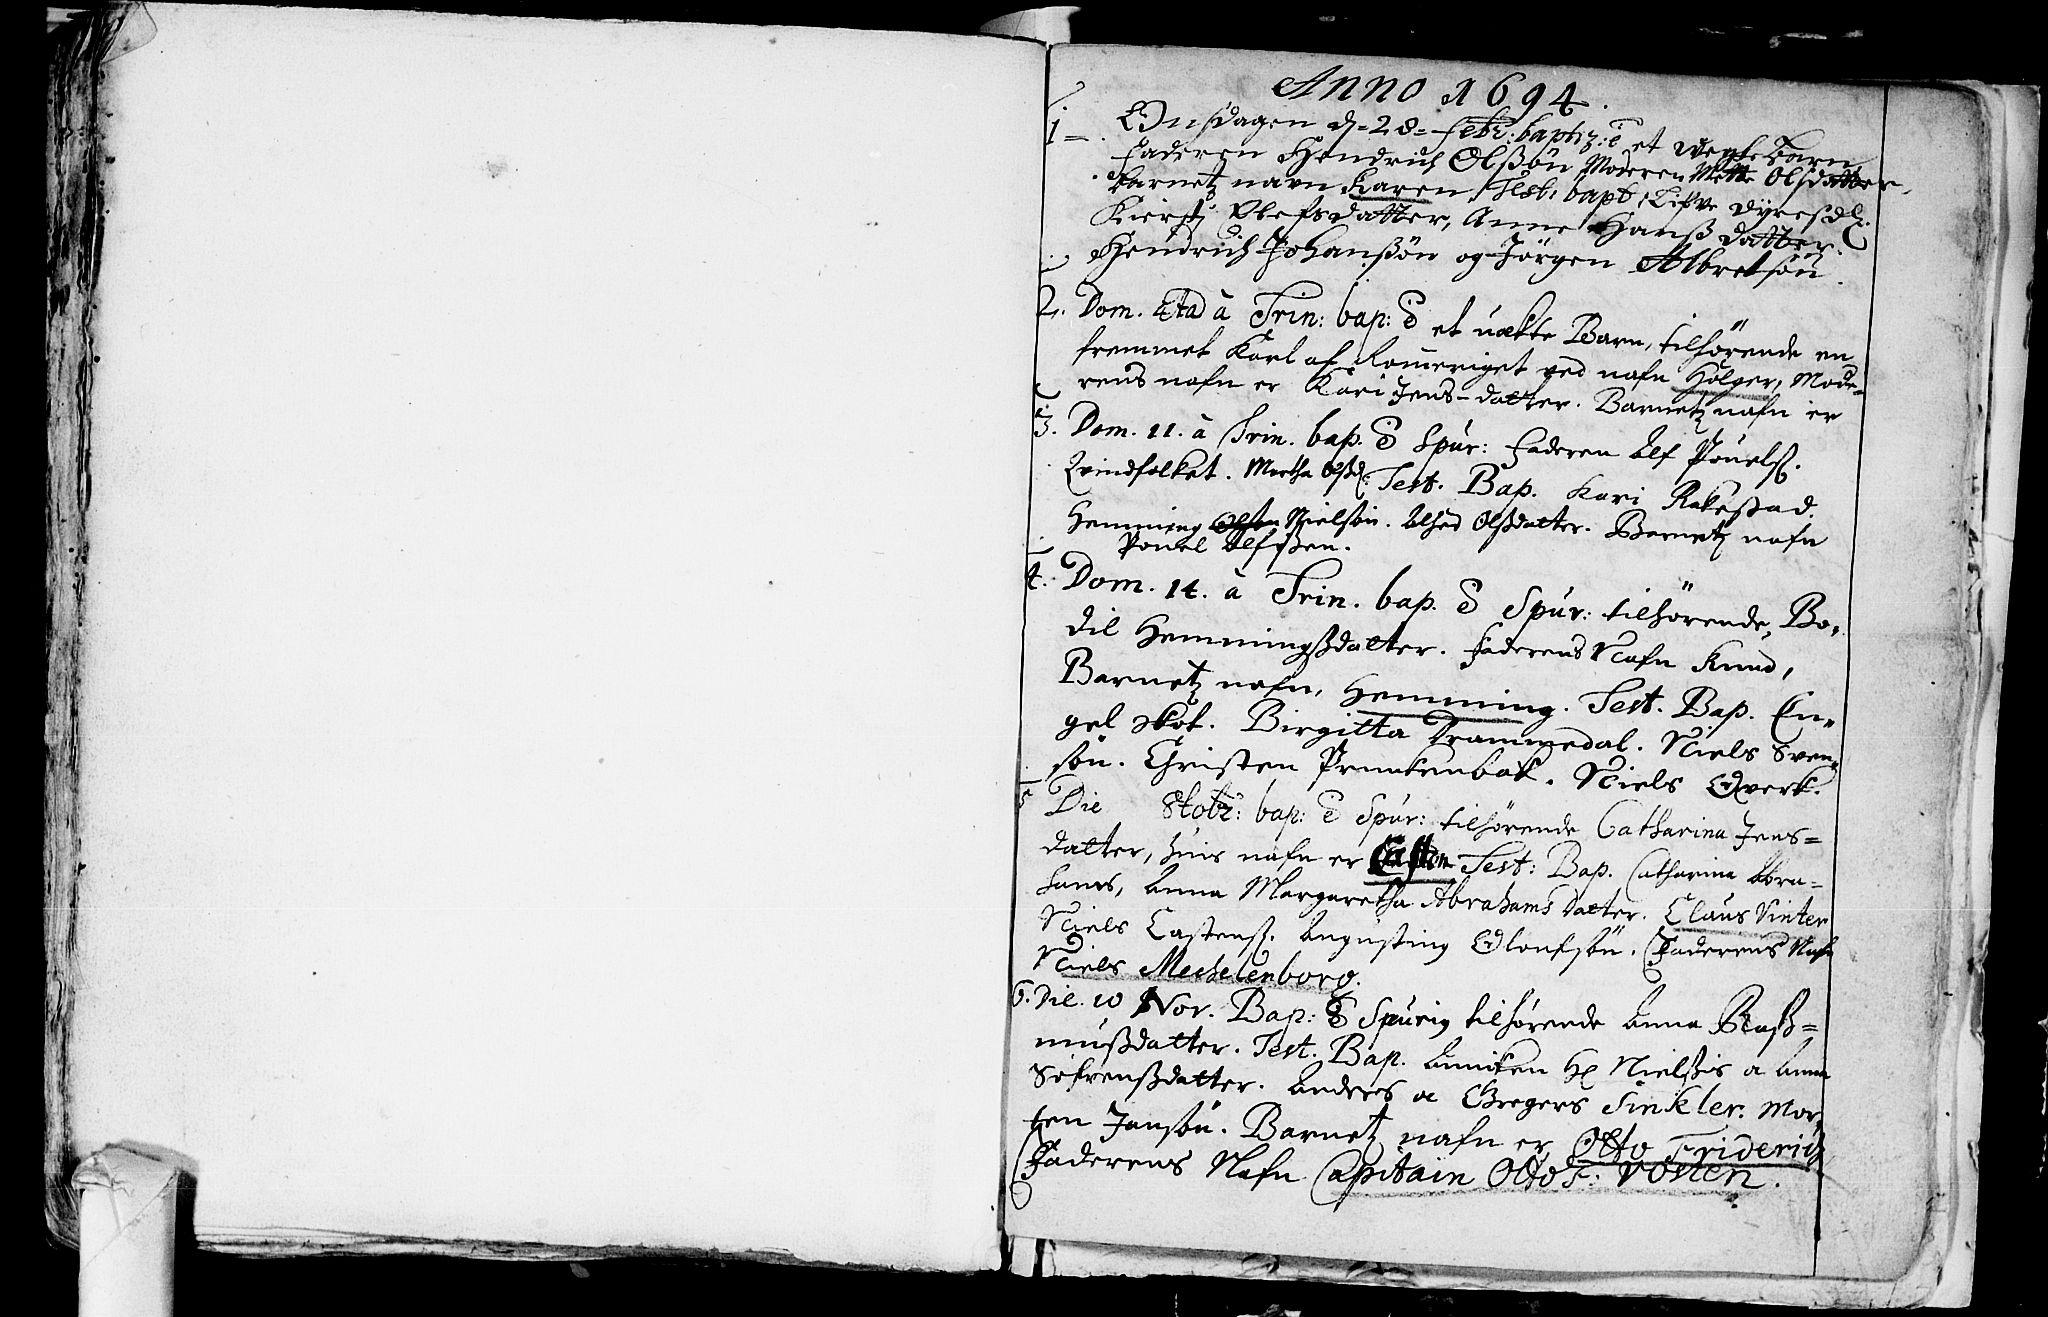 SAKO, Eiker kirkebøker, F/Fa/L0001: Ministerialbok nr. I 1 /1, 1683-1704